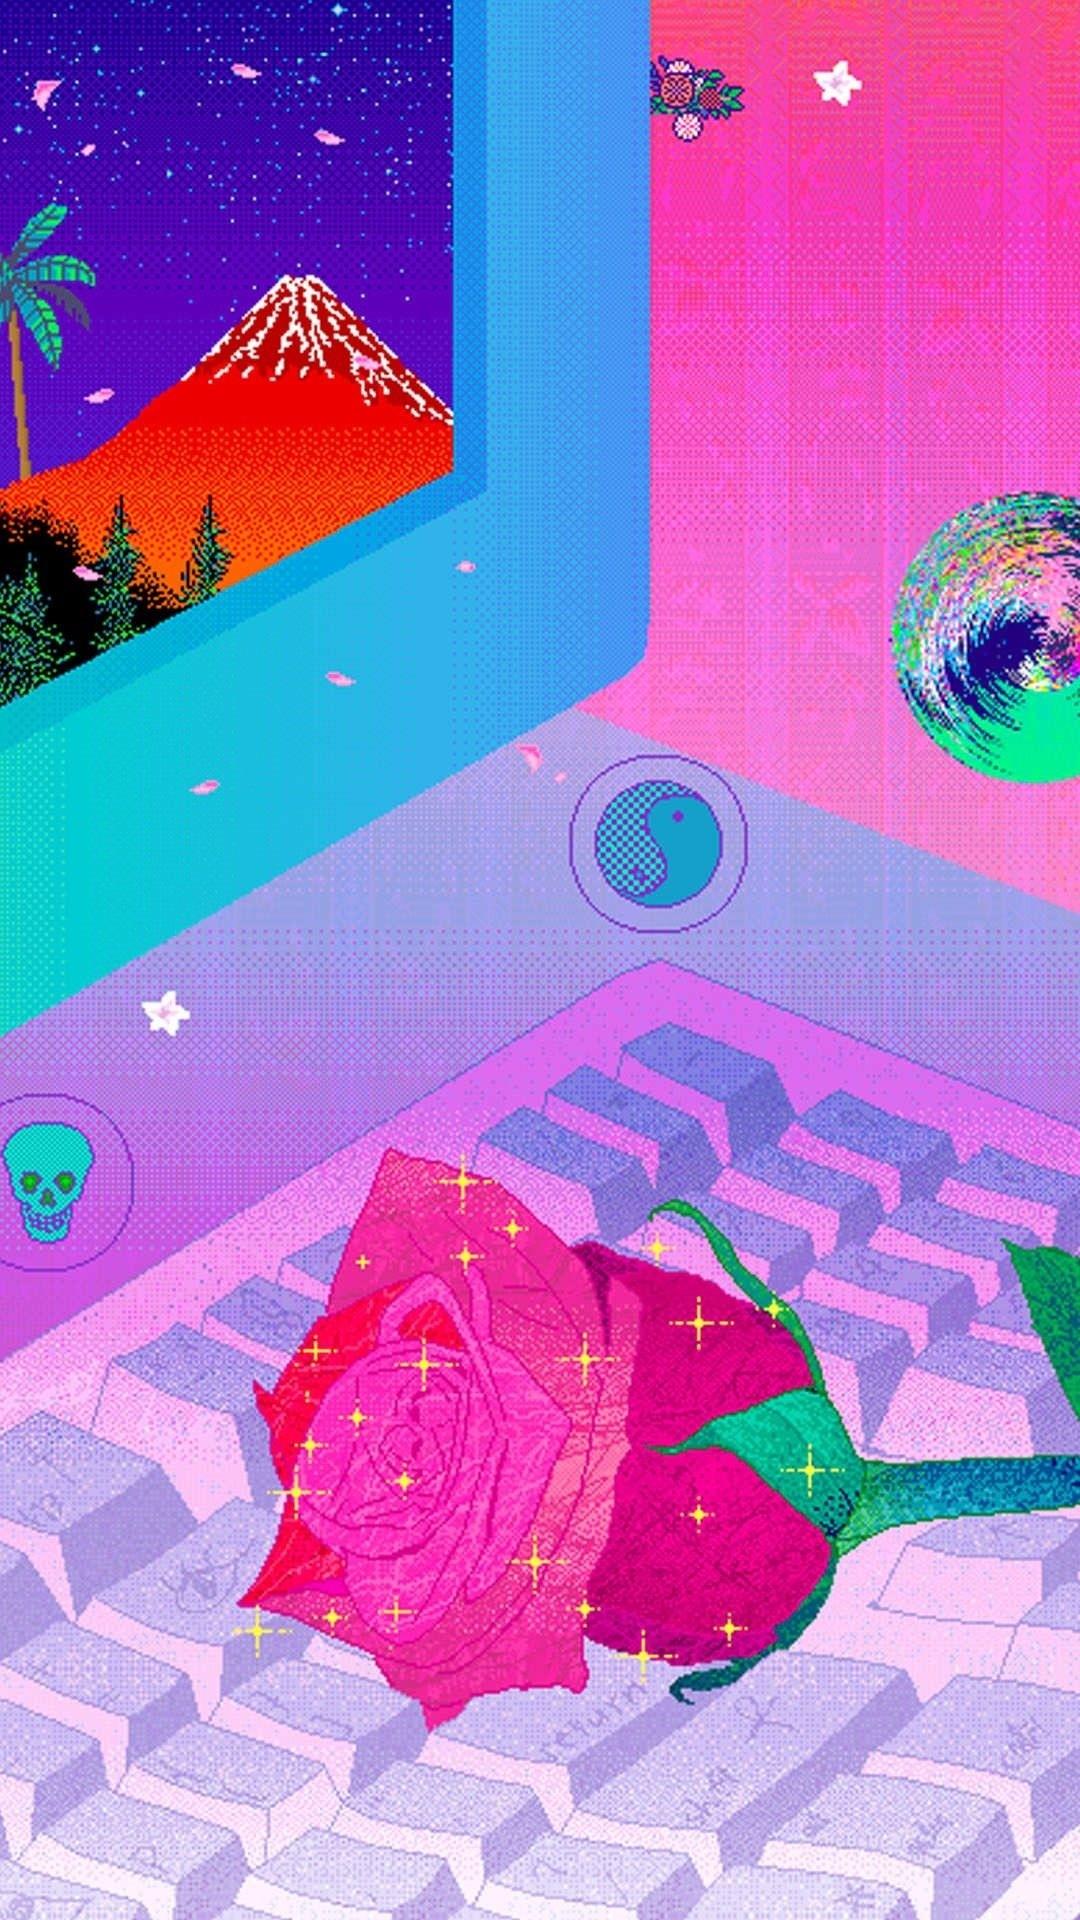 Vaporwave Iphone Wallpapers 19 Images Wallpaperboat